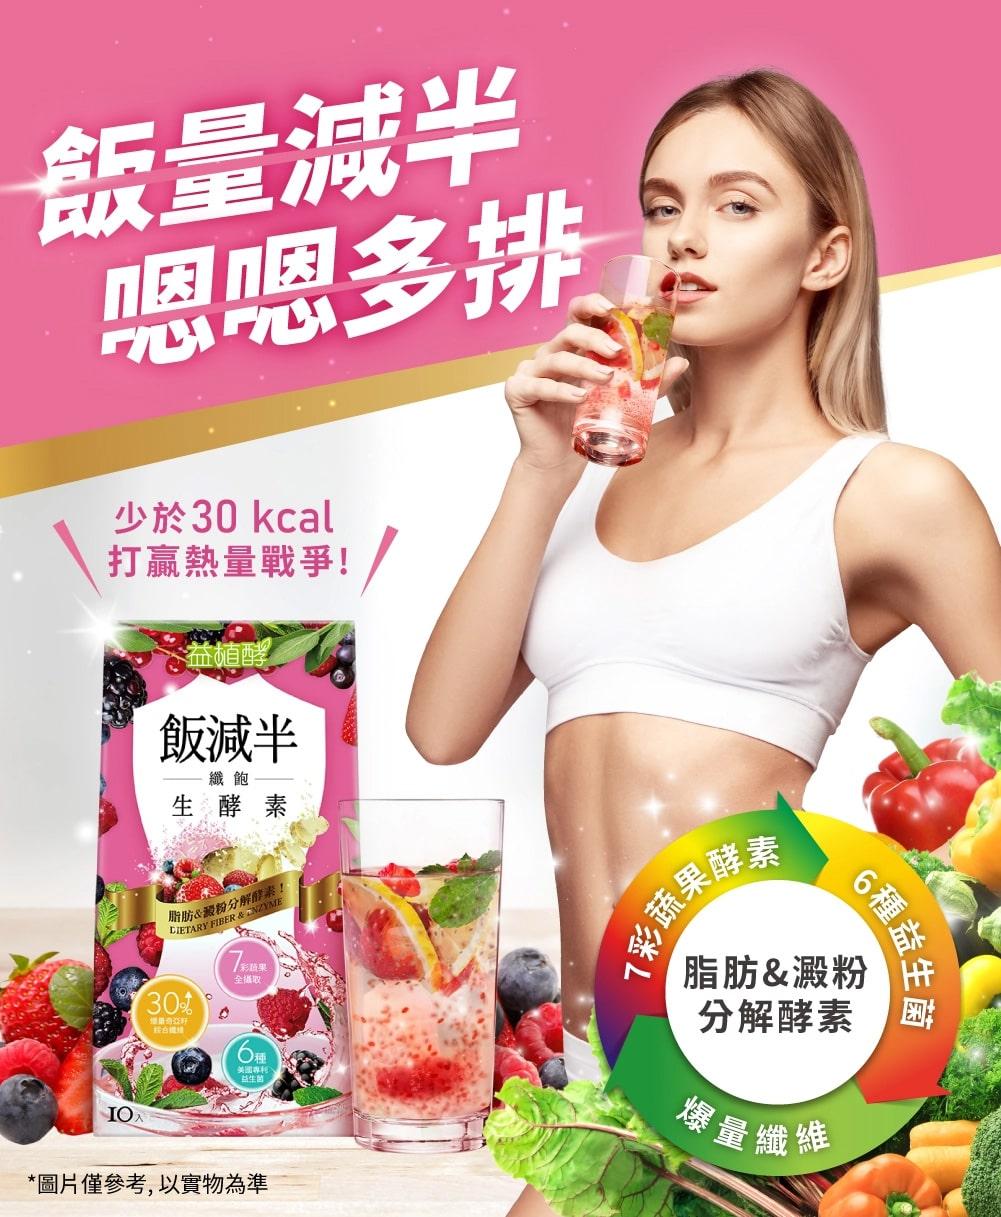 Ejia Dietary Fiber & Enzyme - Intro